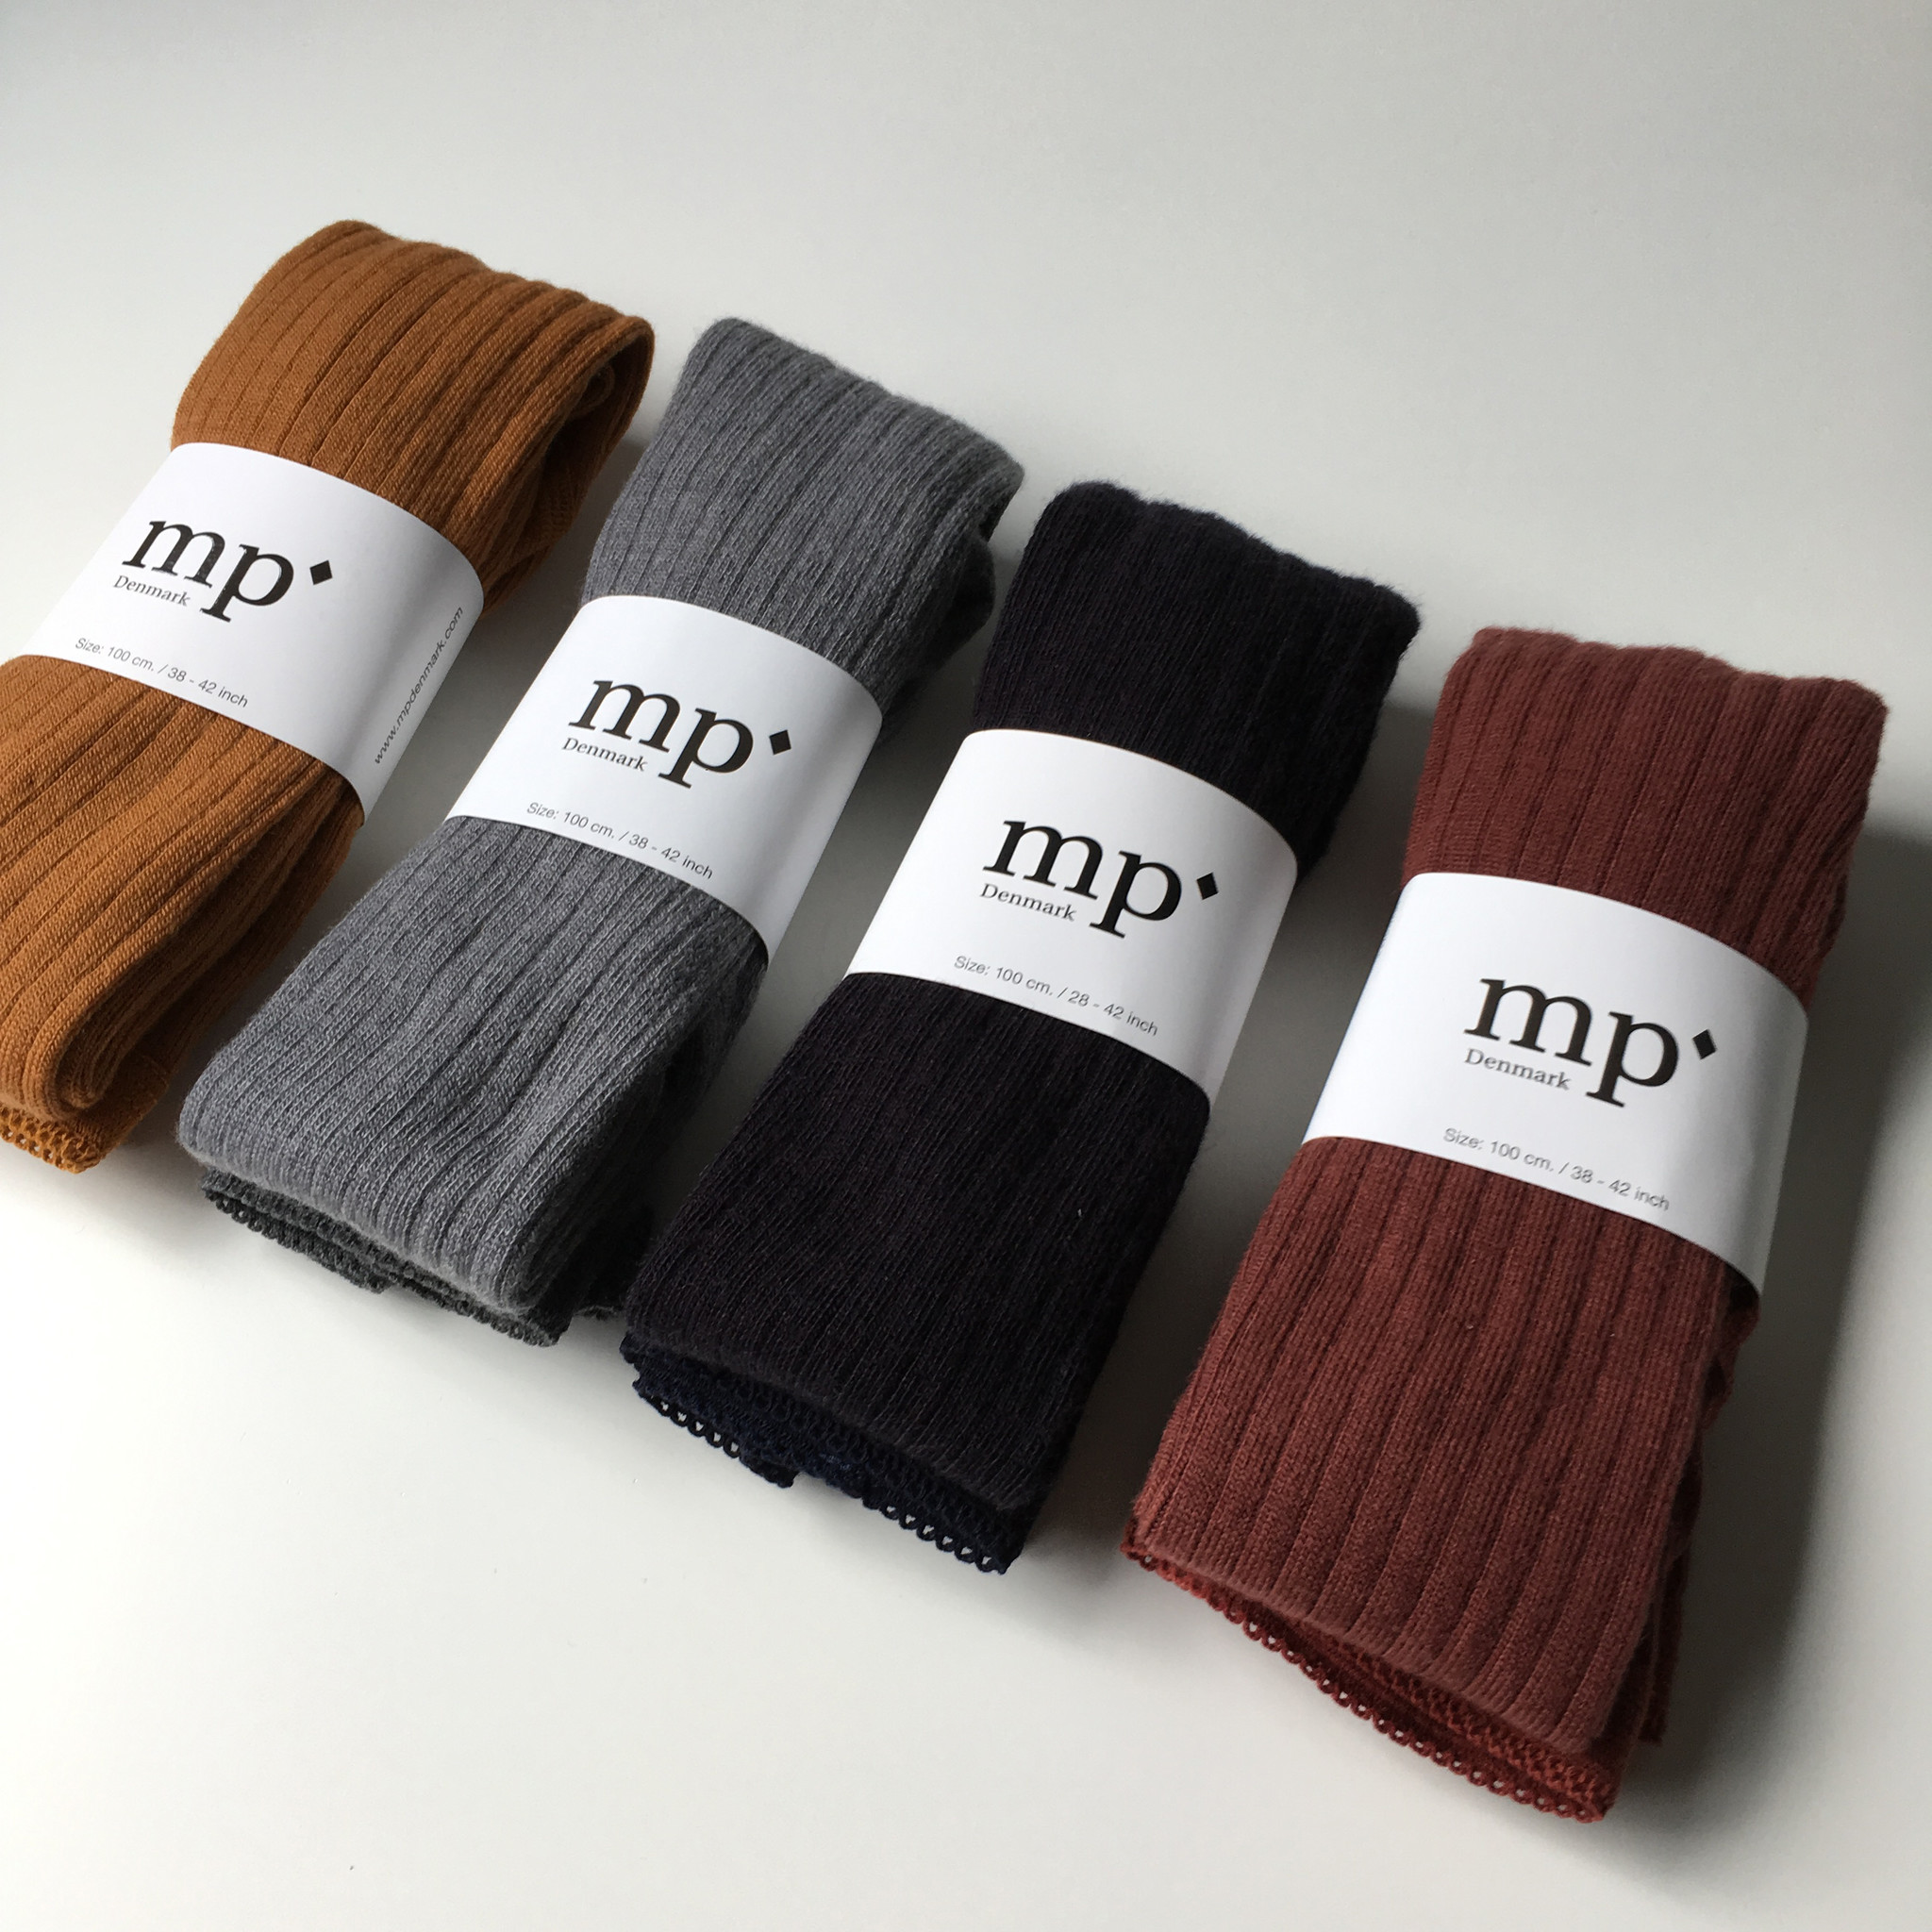 MP Denmark wollen maillot - brede rib - 80% merino wol - roodbruin - 90 tm 160